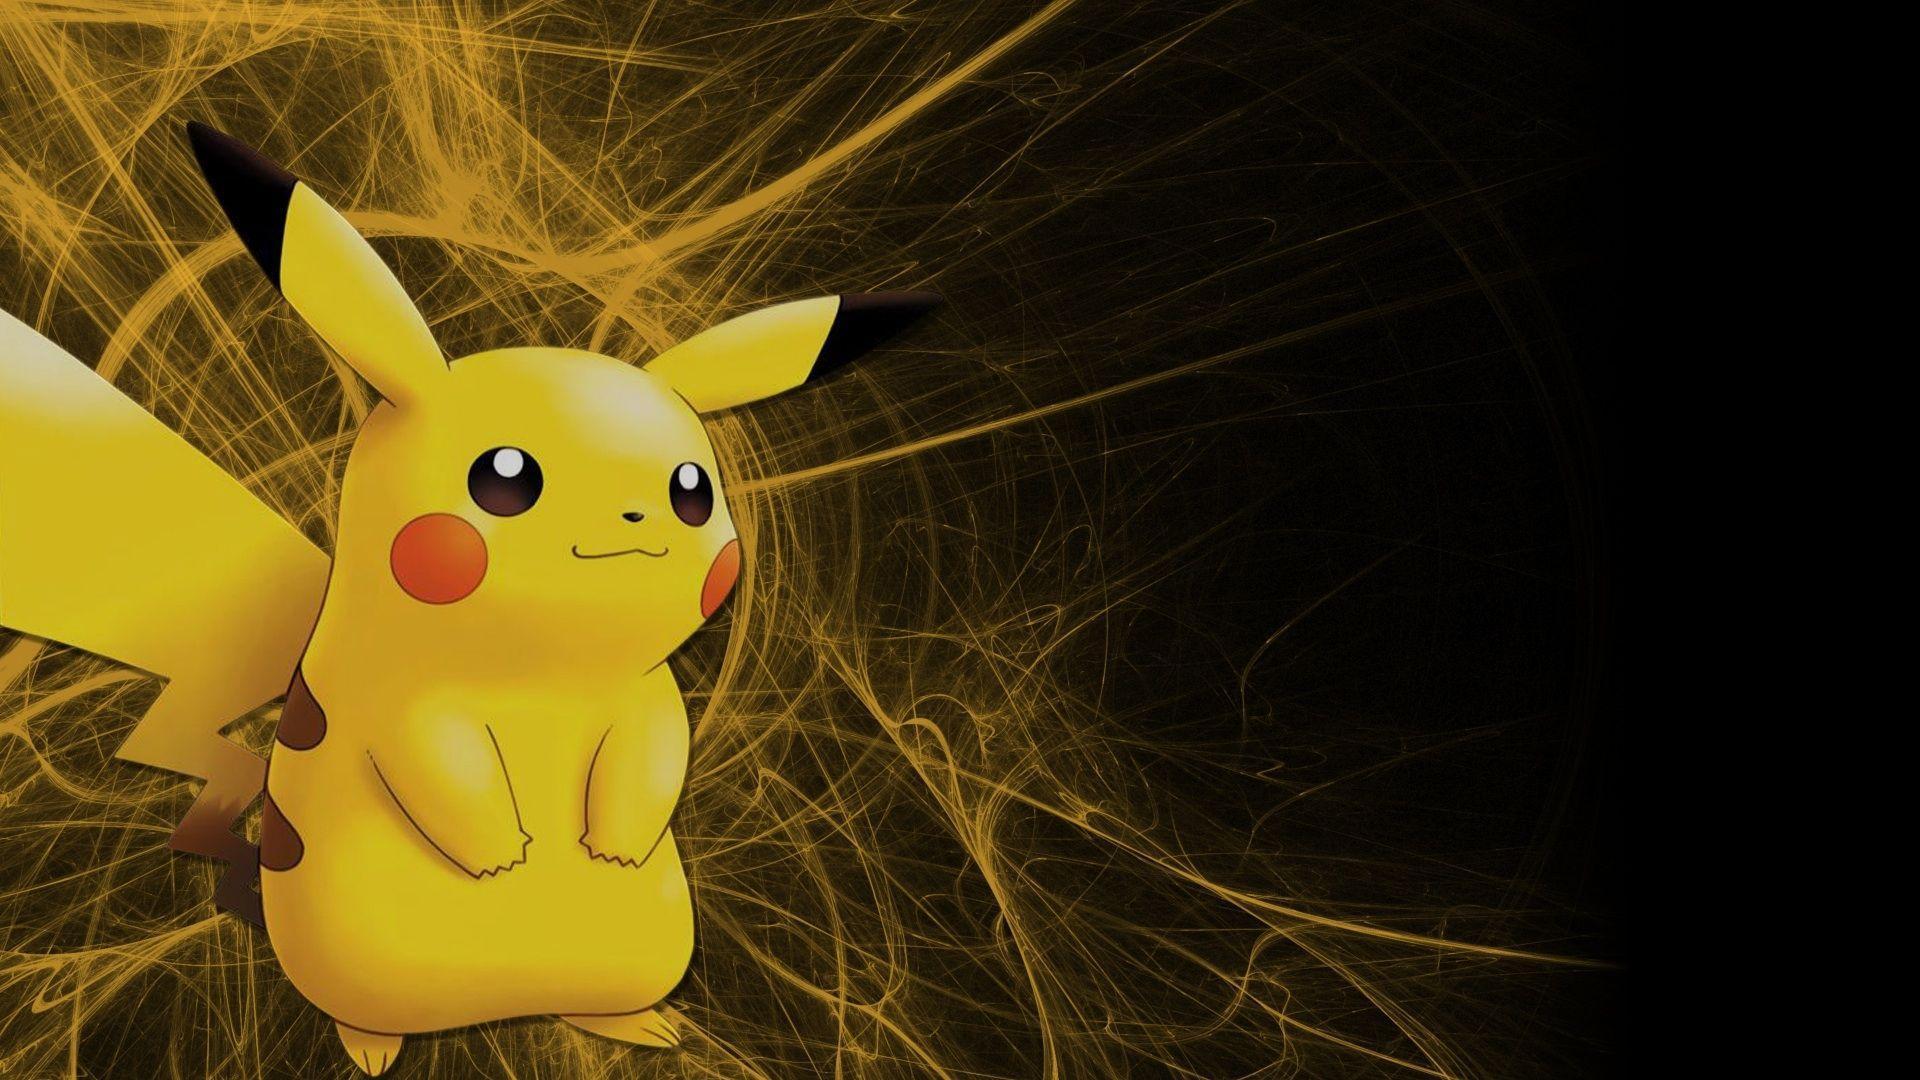 Pikachu Pokémon Wallpapers - Wallpaper Cave